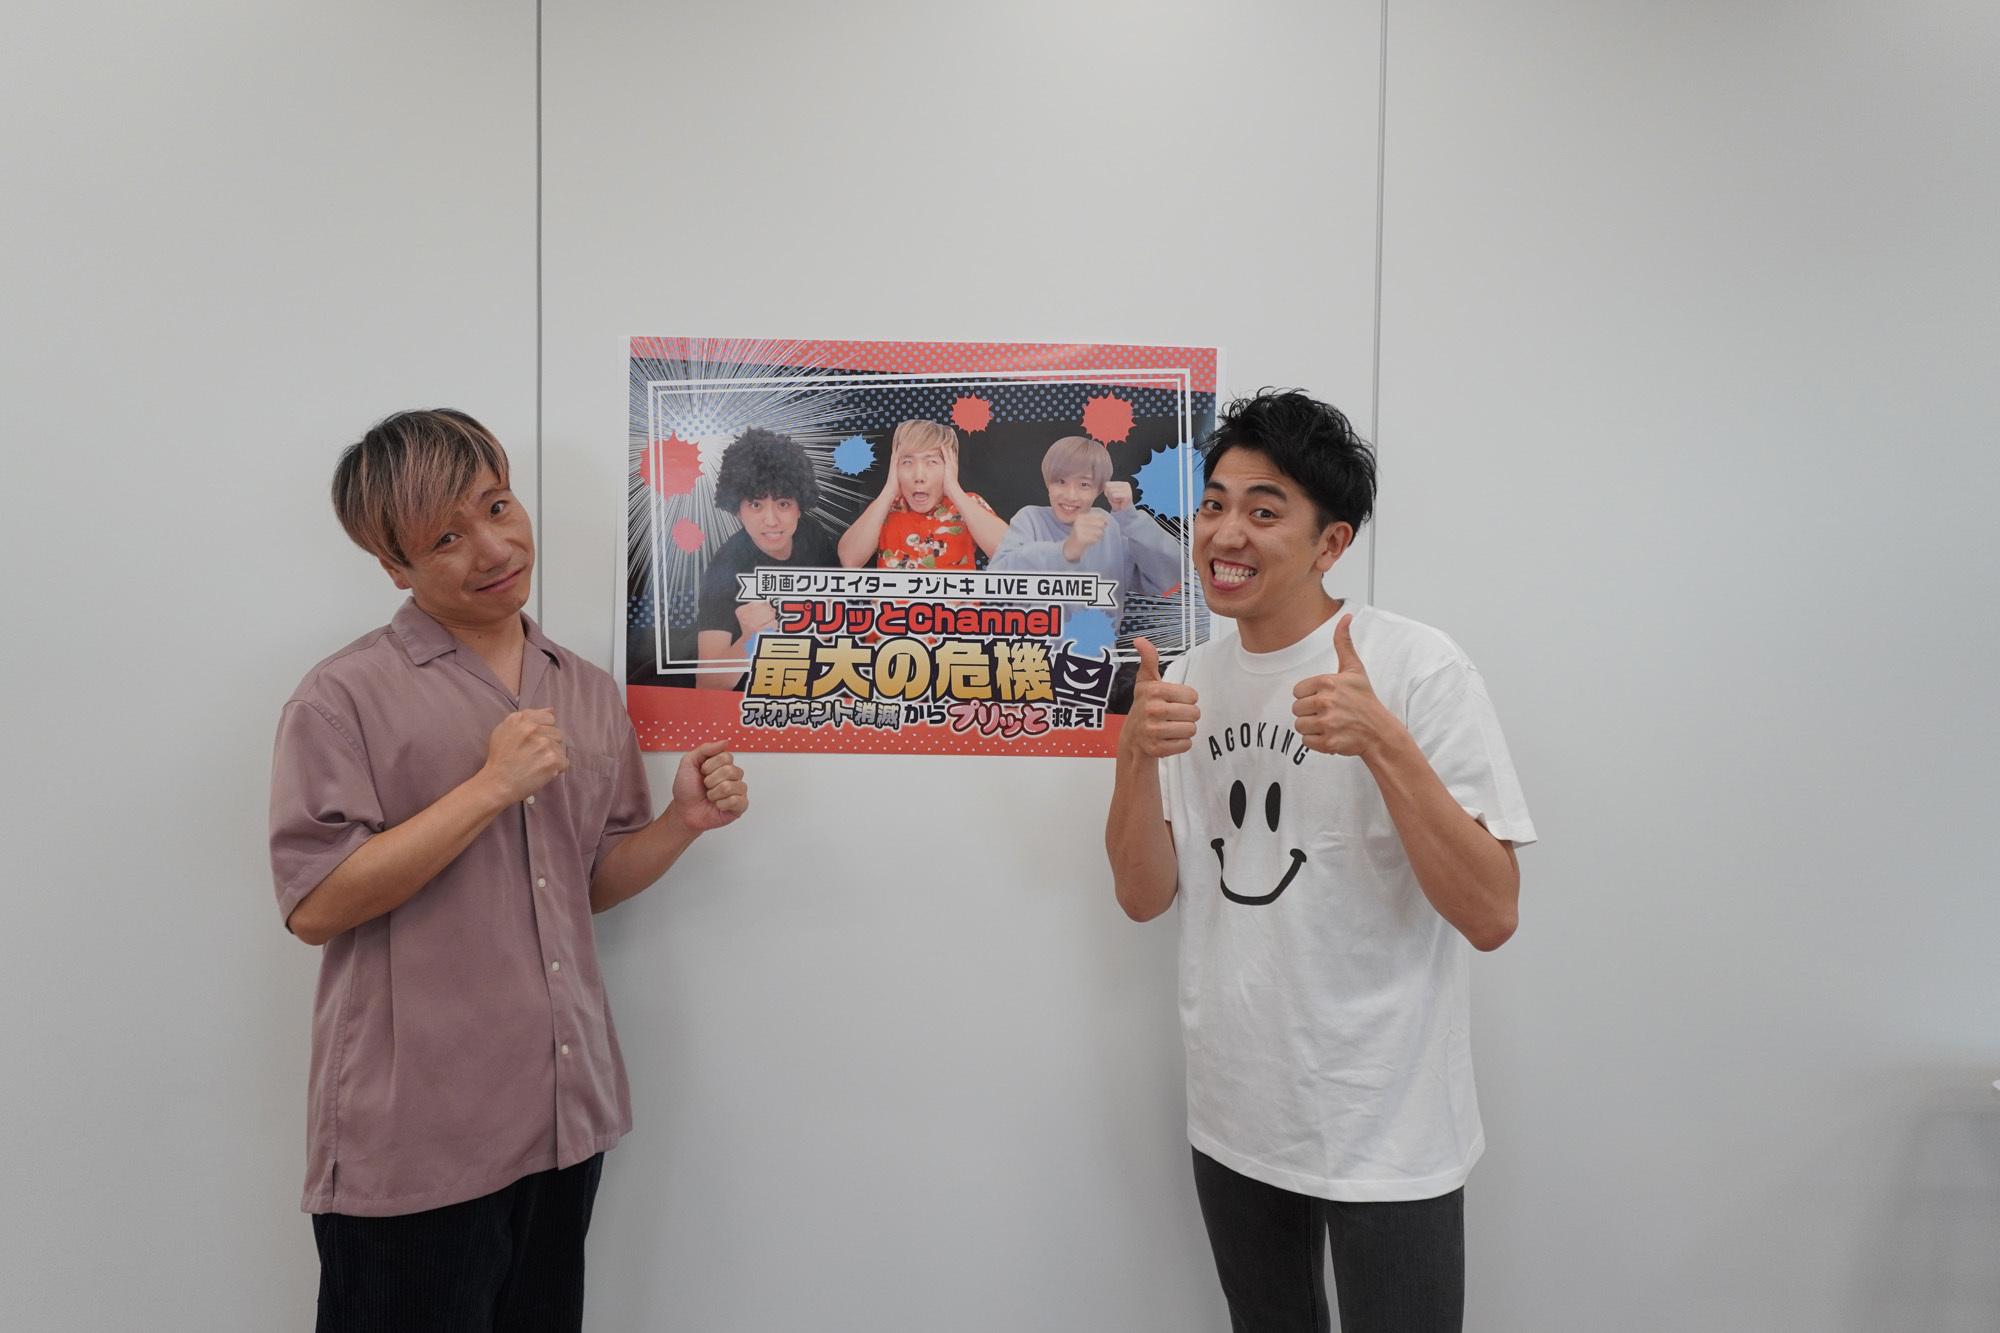 TOP差し替え候補:DSC02688.JPG